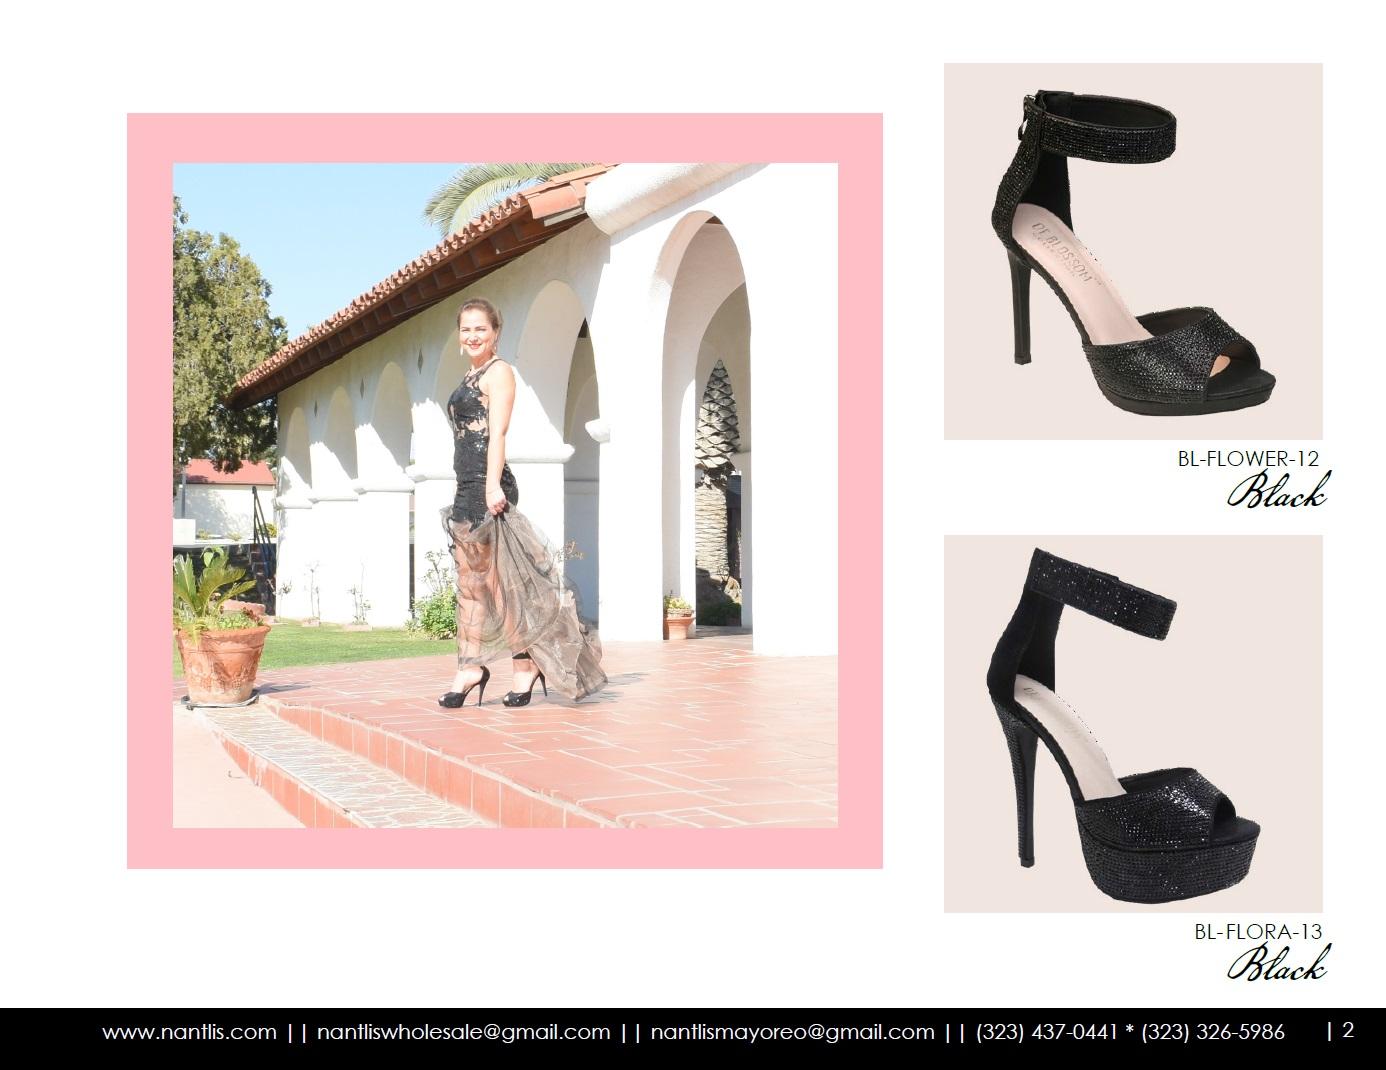 Nantlis Vol BL50 Zapatos de Mujer mayoreo Catalogo Wholesale womens Shoes_Page_02